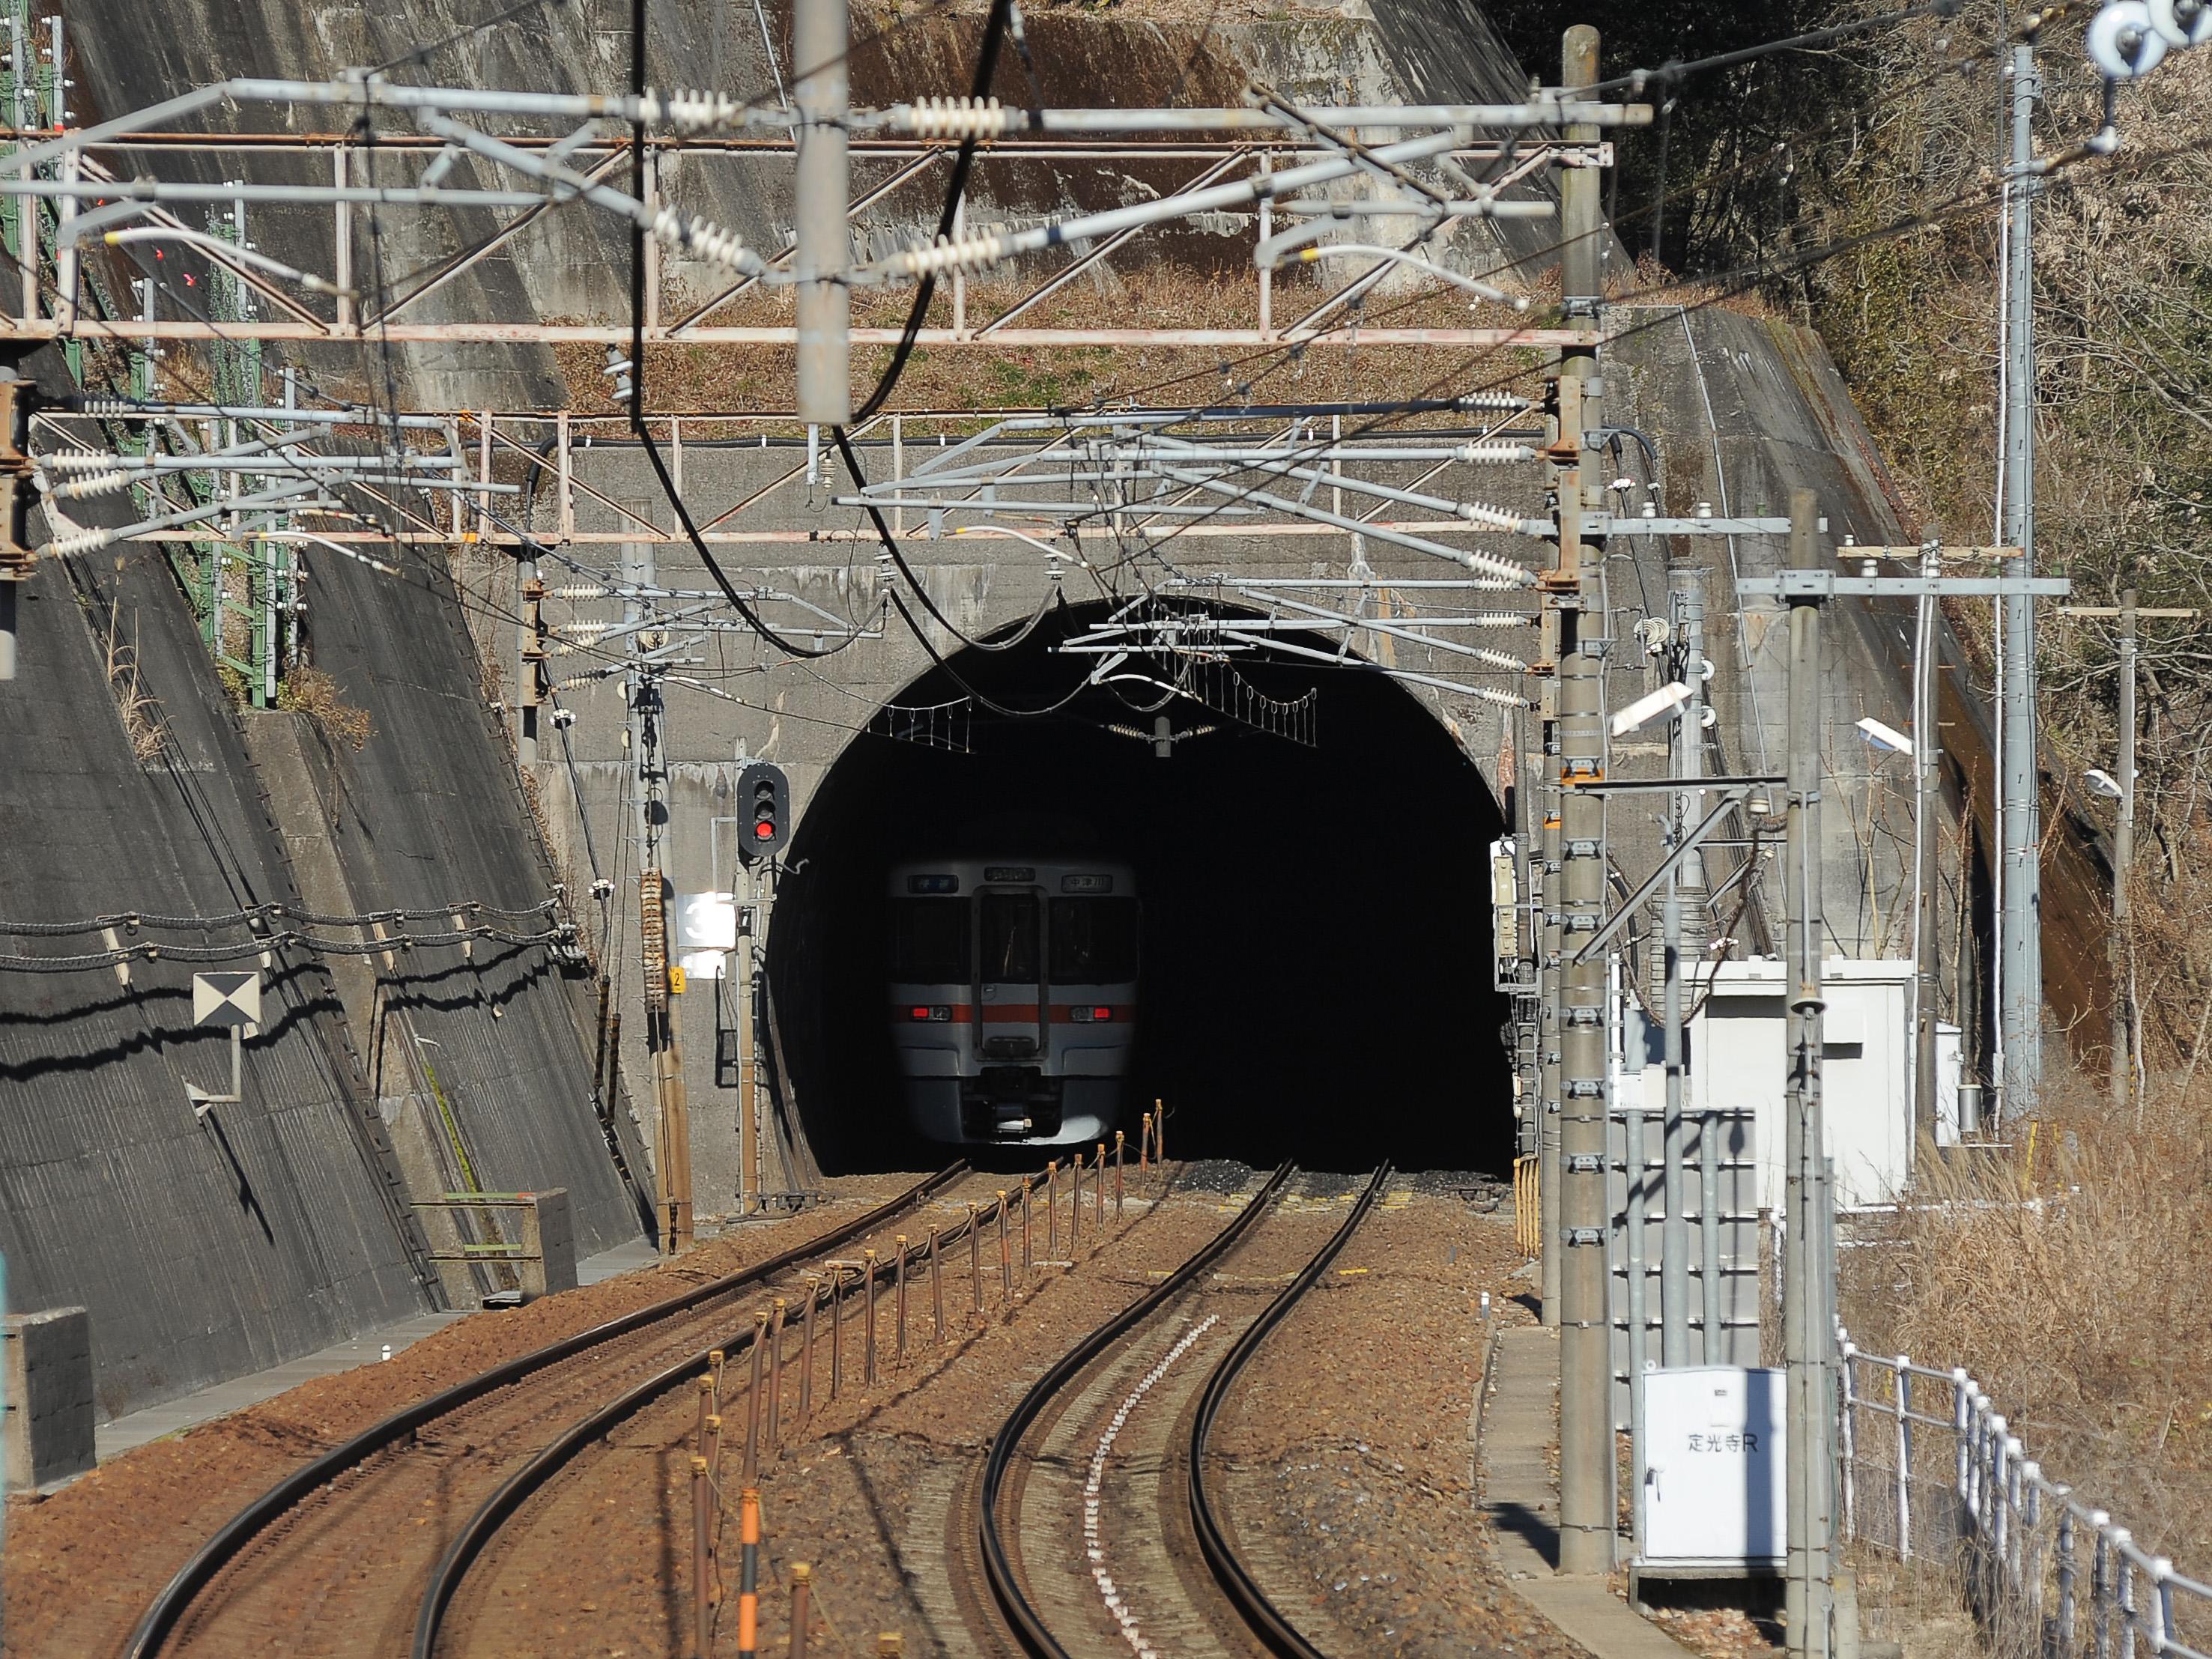 https://upload.wikimedia.org/wikipedia/commons/6/69/JR_Central_Aigi_tunnel.jpg